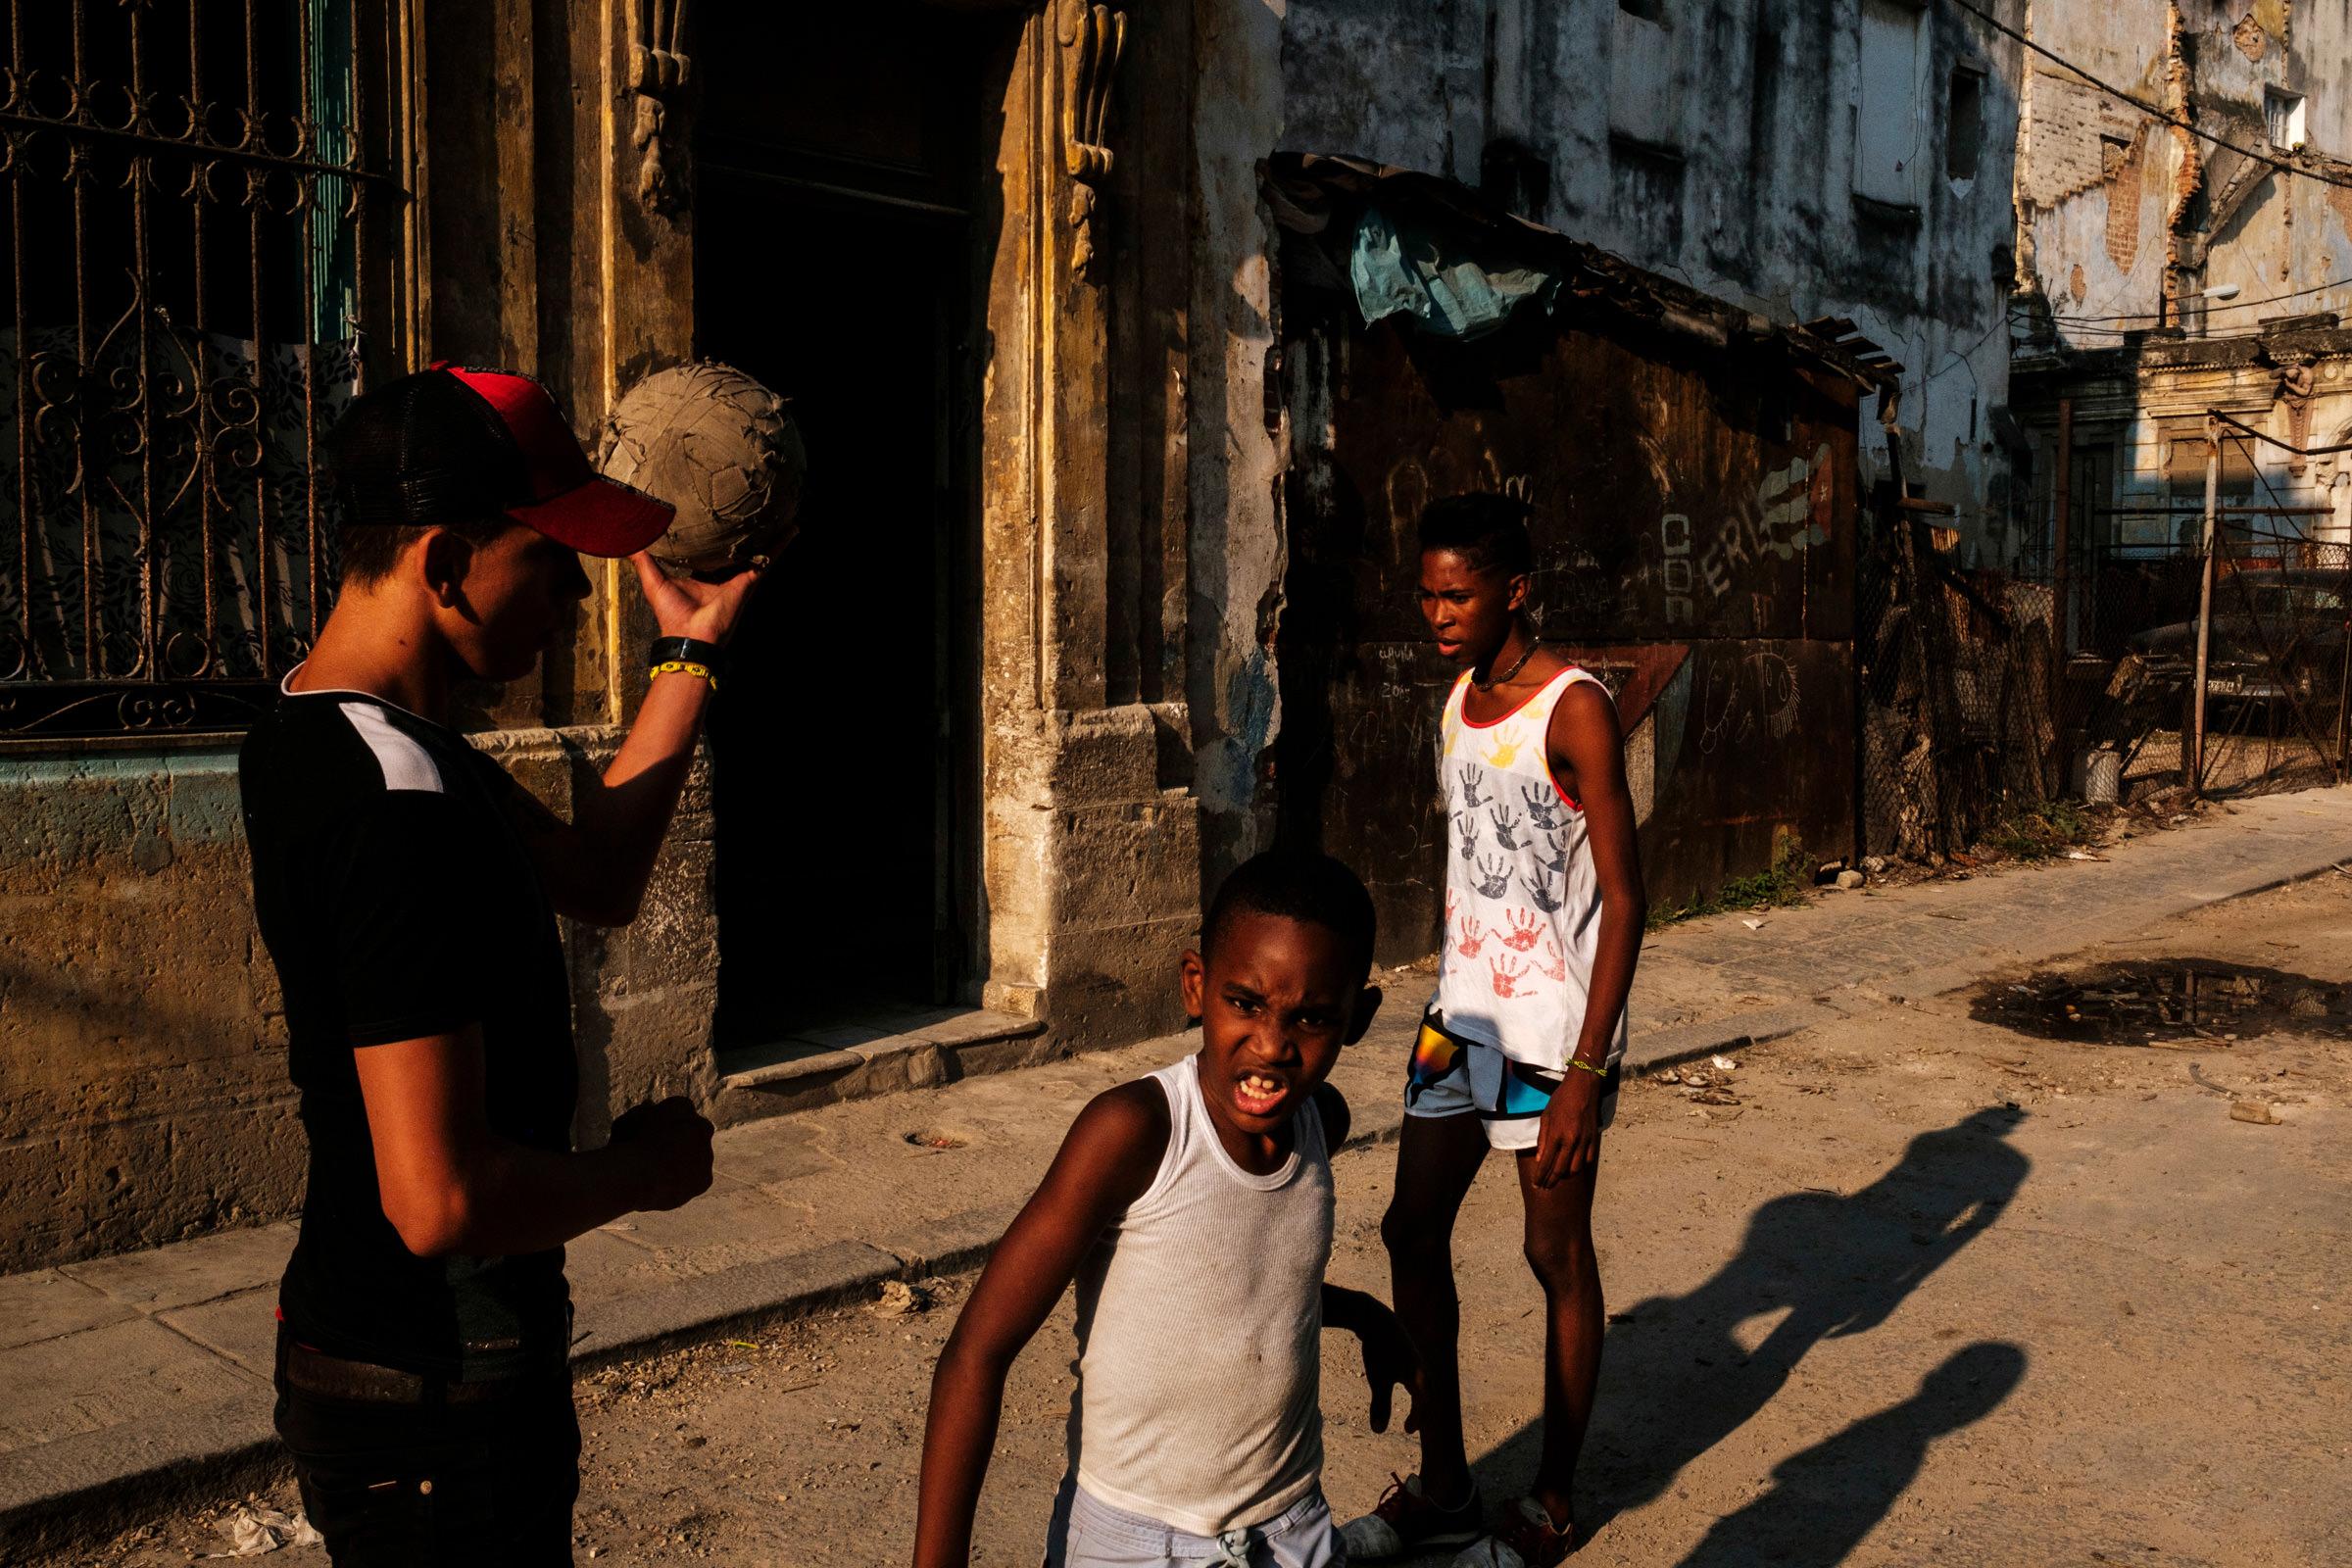 Cuba-Street-Photography-19